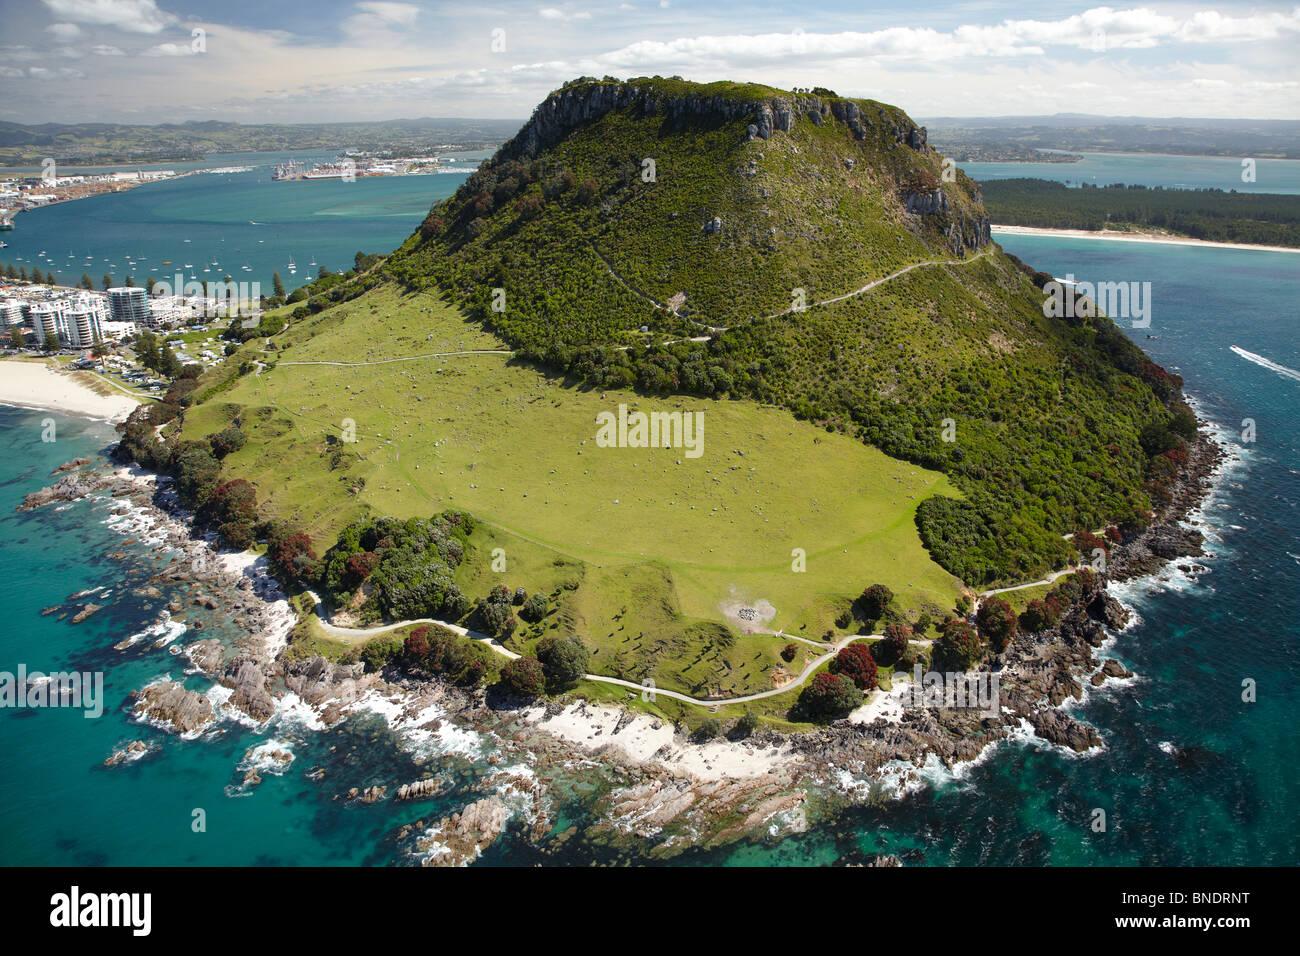 the island of plenty